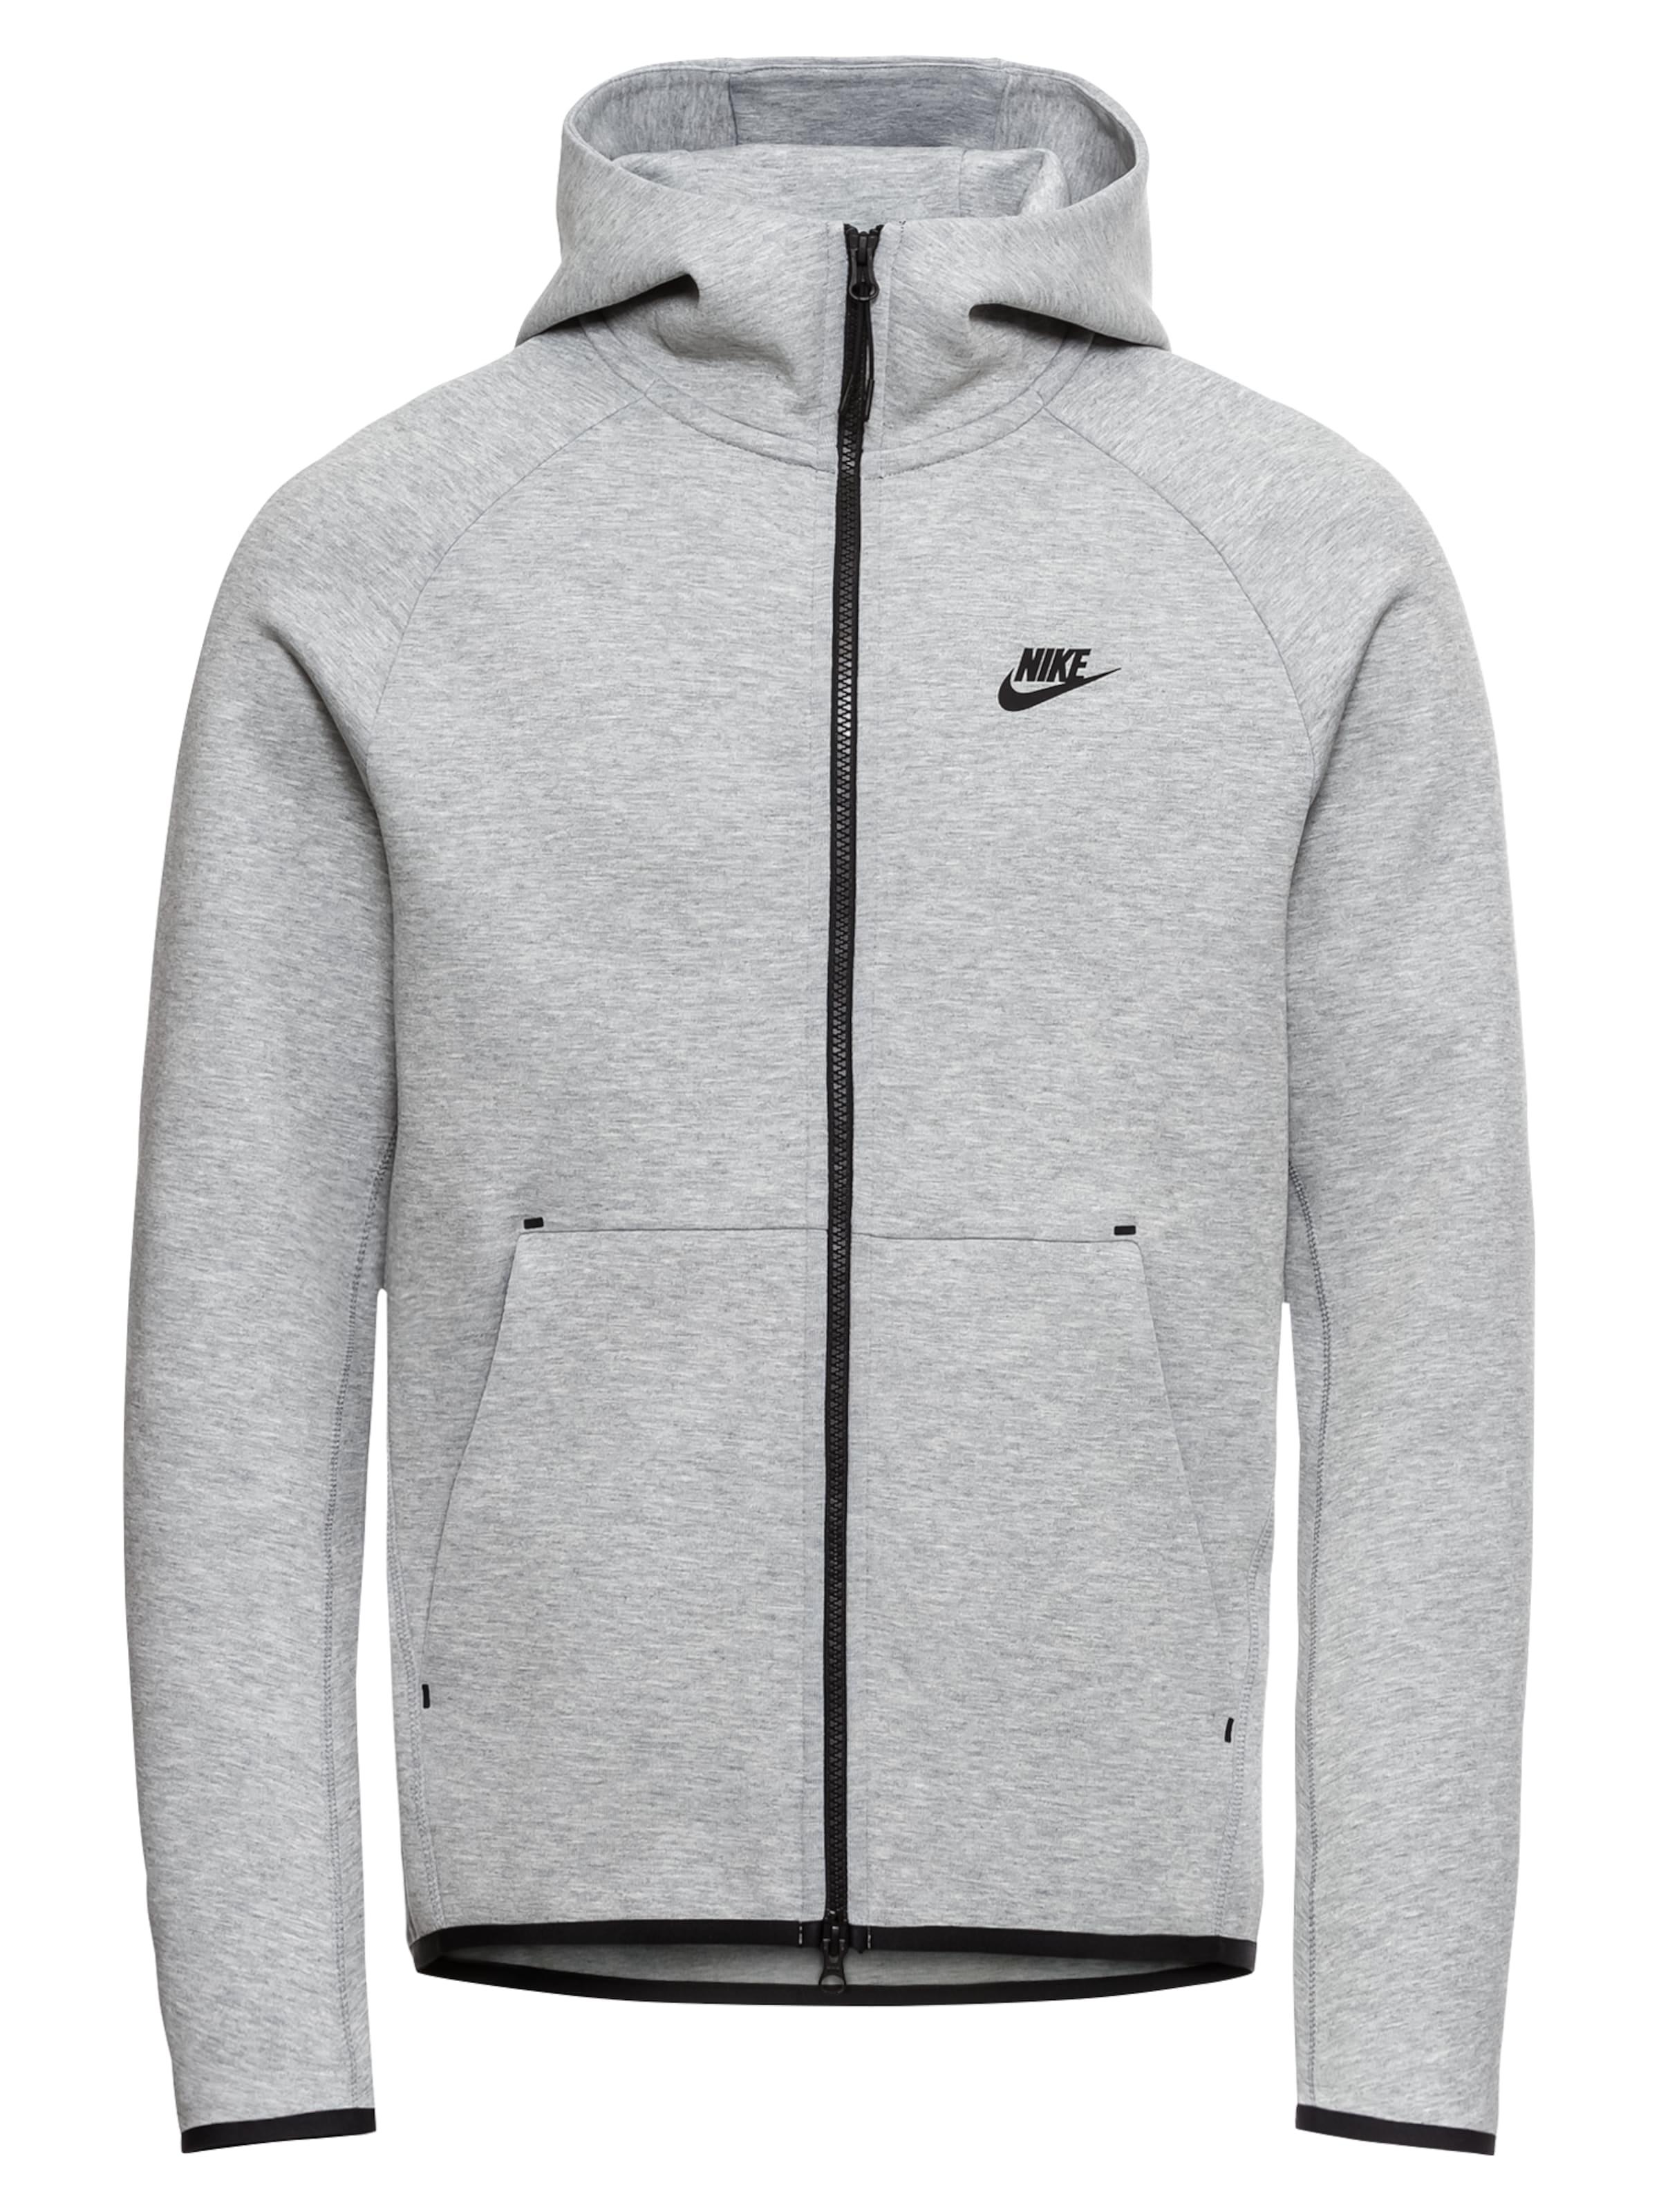 Flc Veste 'm Foncé Fz' De Hoodie Tch Gris Nsw Nike En Survêtement Sportswear dsthrCQ